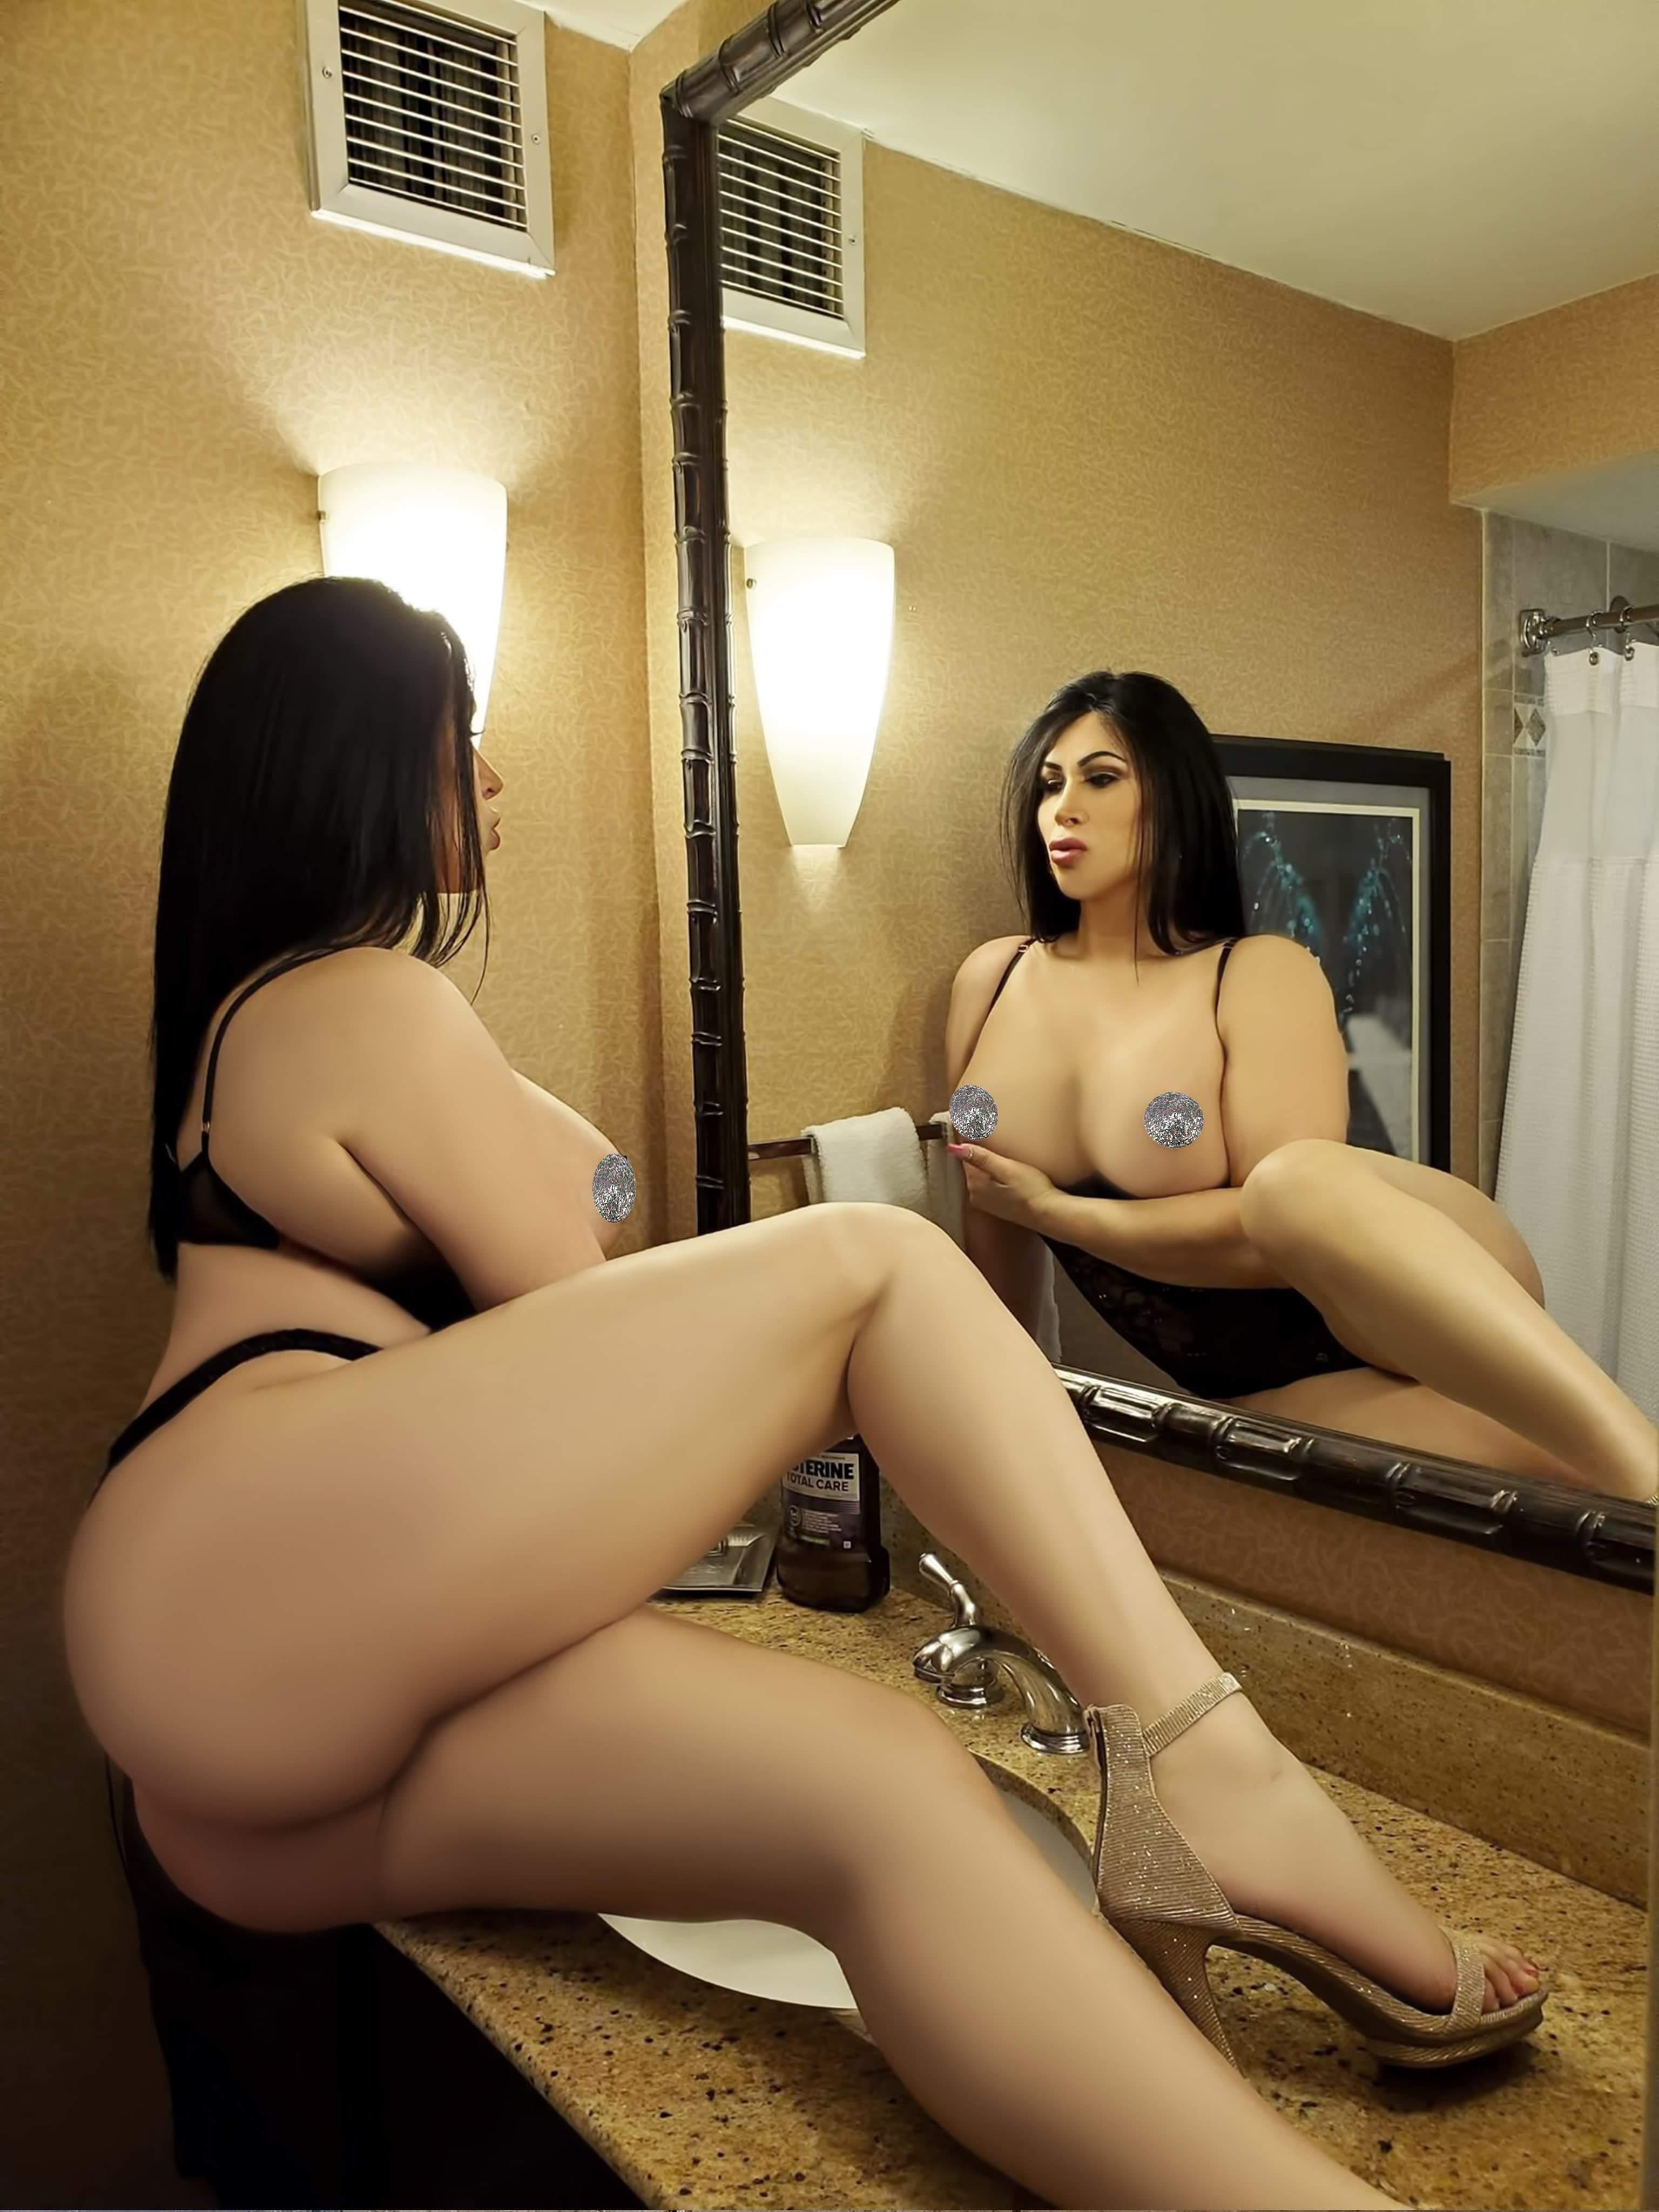 Leyla Profile, Escort in Houston, 2142705259